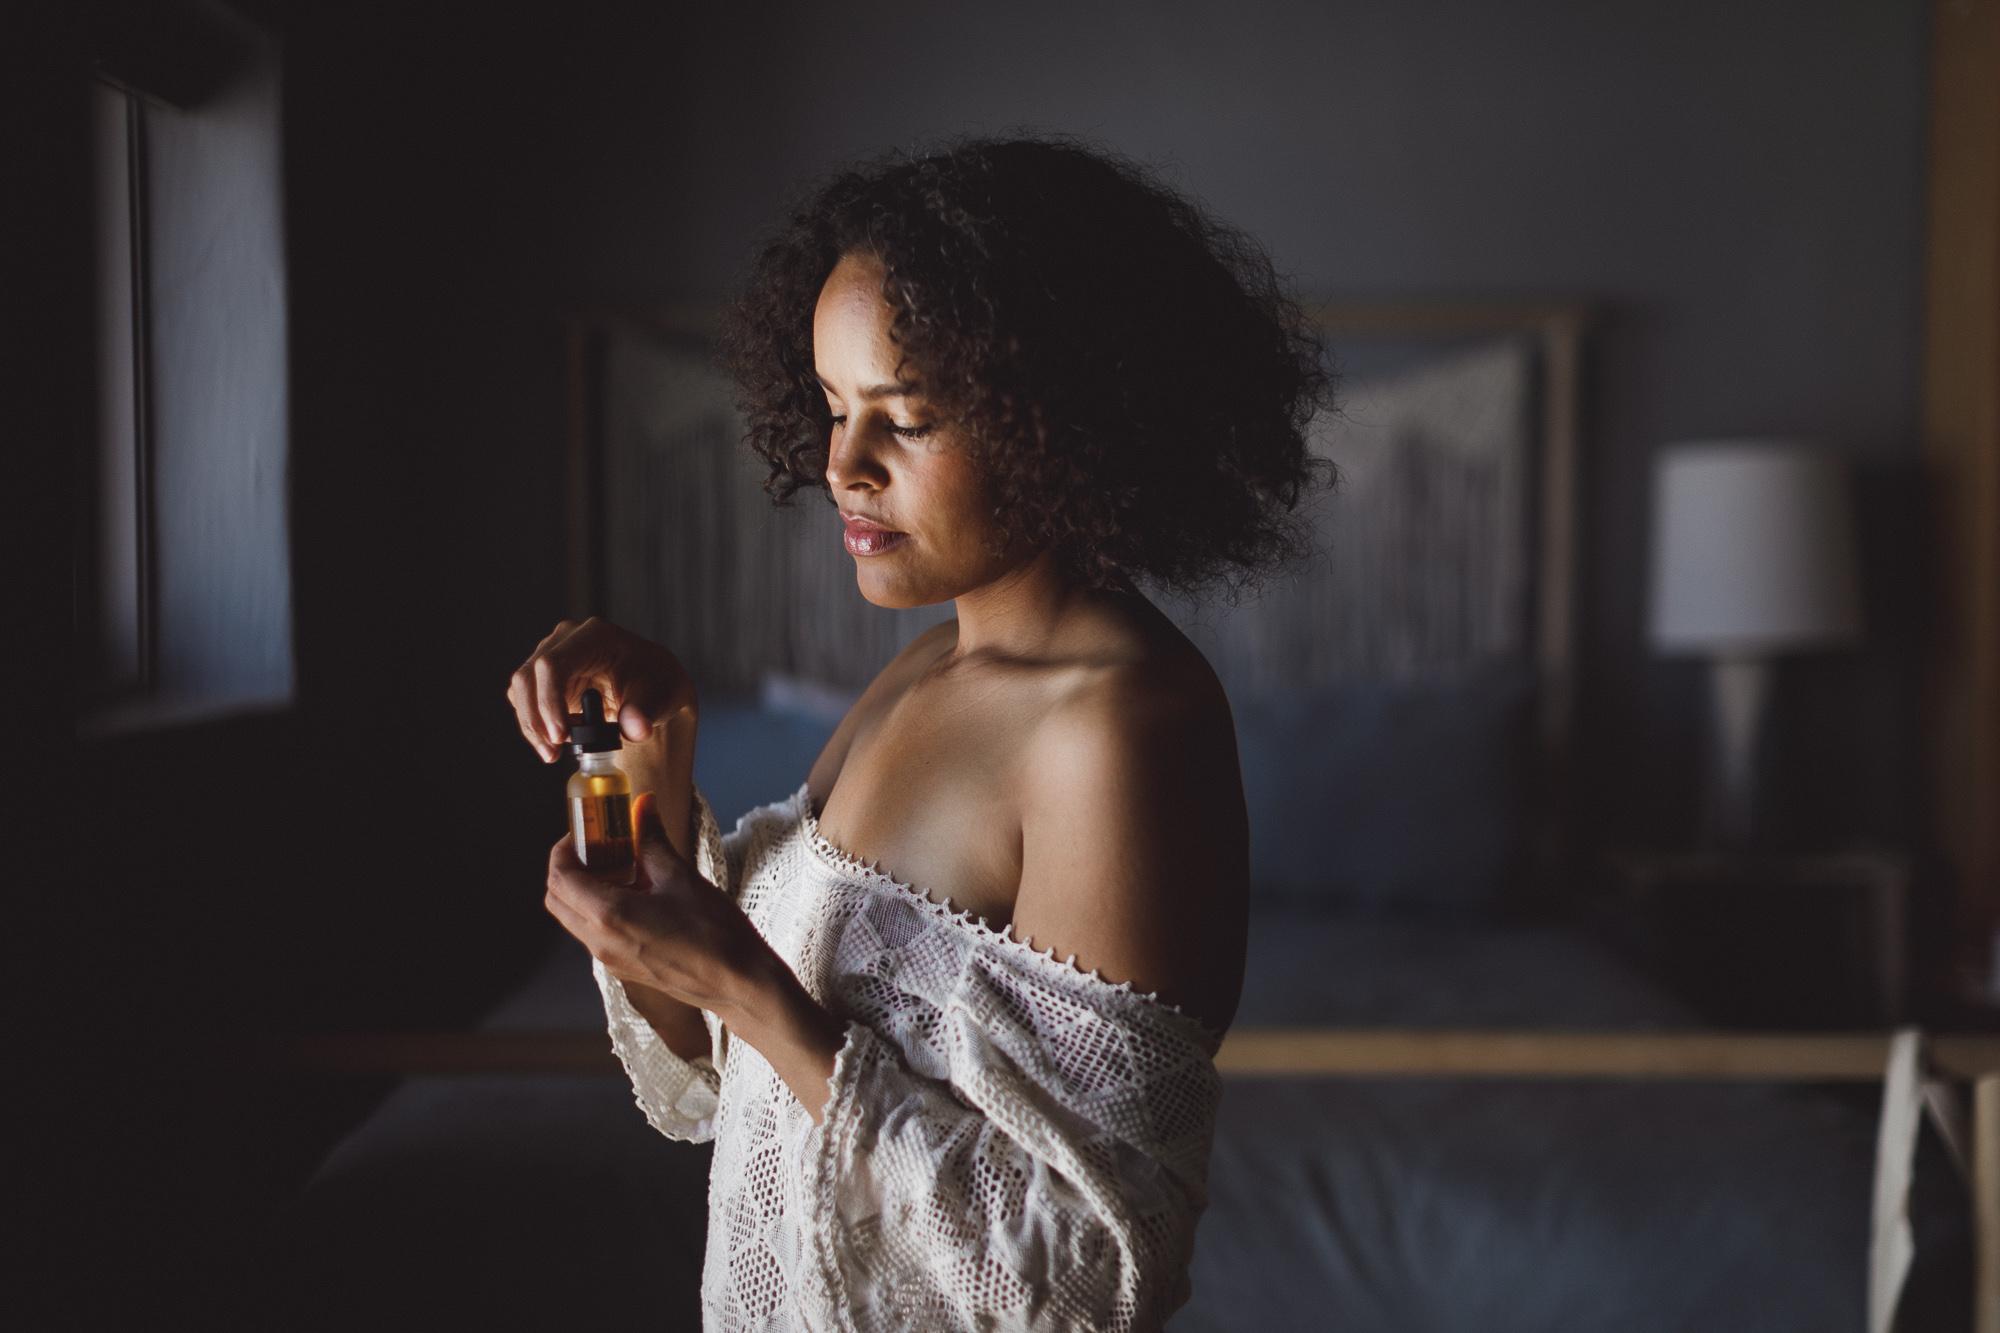 JENNIFER SKOG cannabis lifestyle photographer